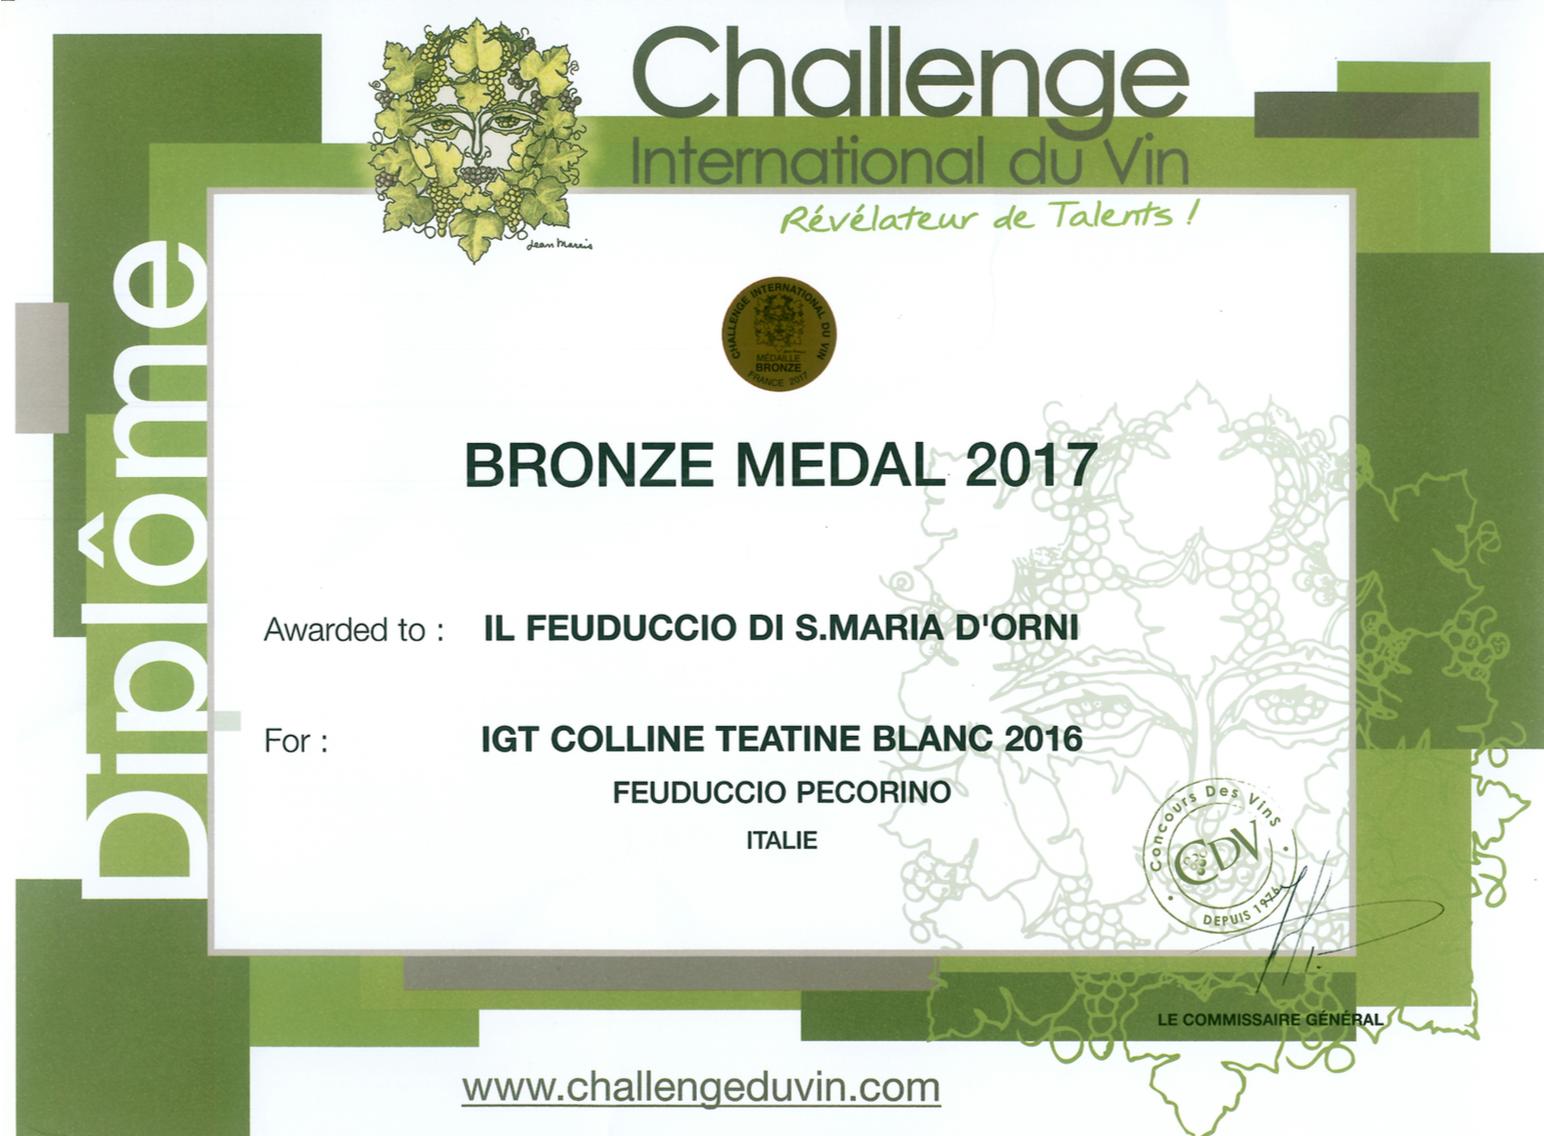 Challenge du Vin - Feuduccio Pecorino 2016: Bronze Medal 2017